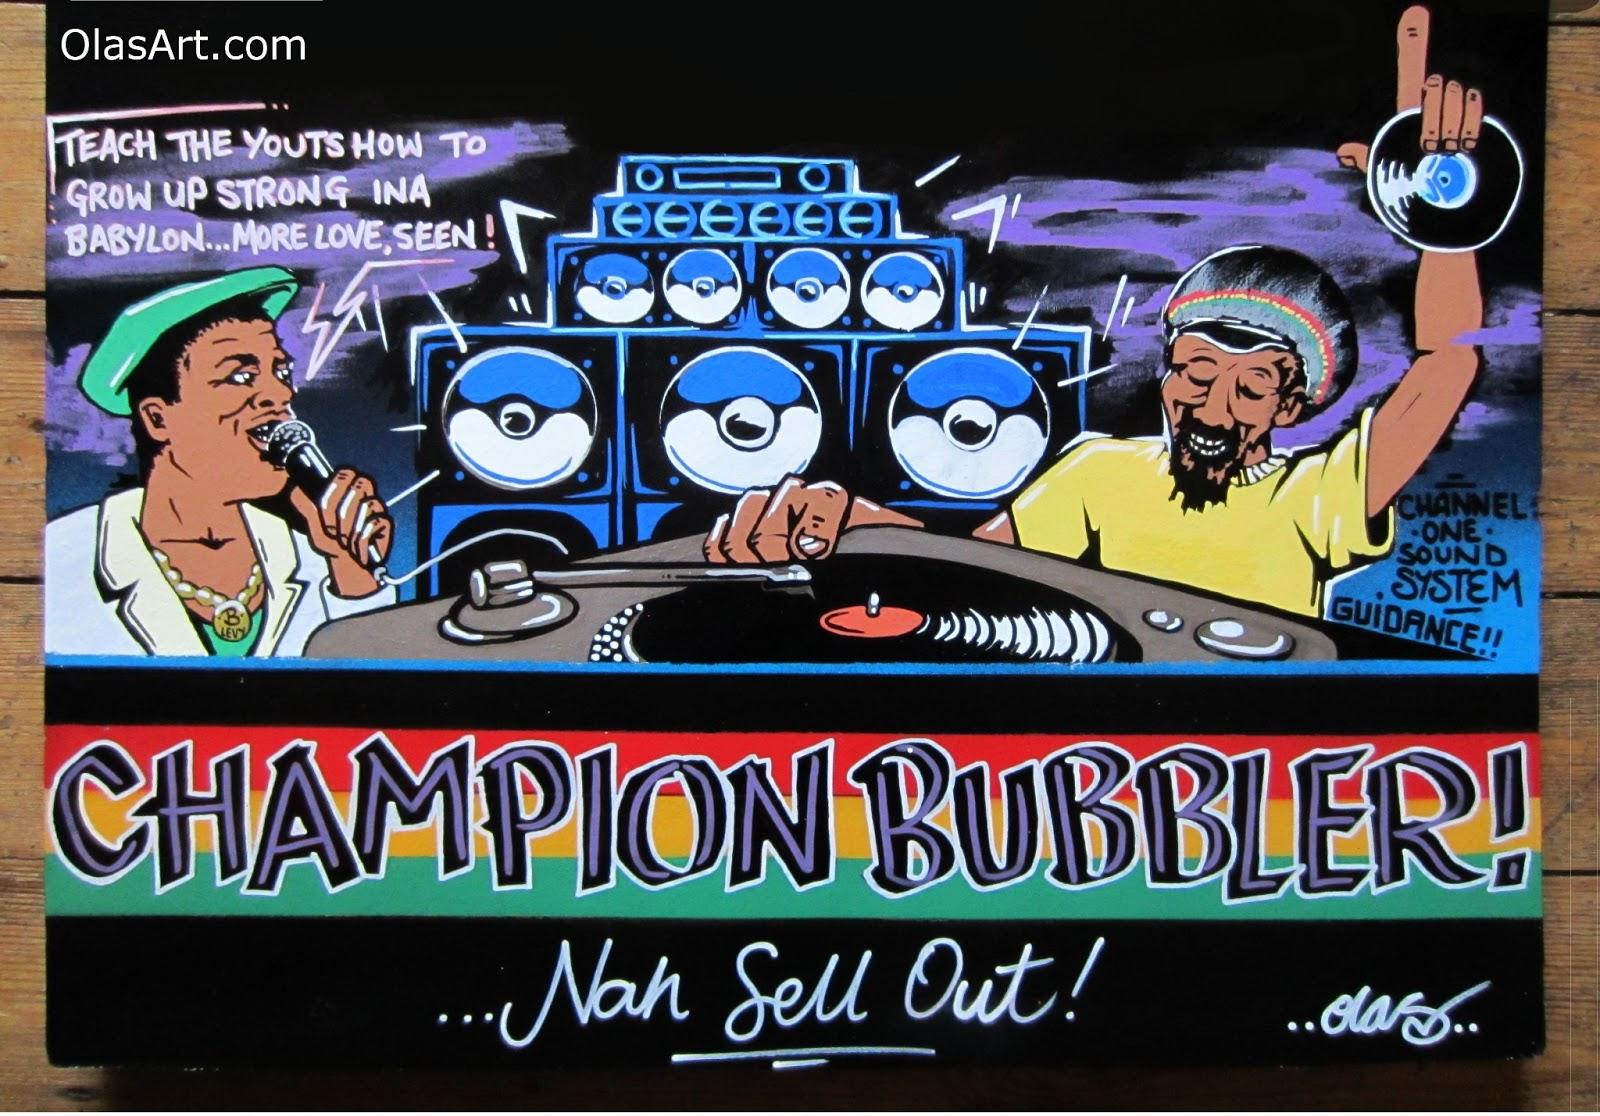 http://1.bp.blogspot.com/-dr_iDHdPFBU/UUYRbPPM_rI/AAAAAAAAAqU/O5_TbF26a-M/s1600/Bubbla+Nah+Sell+Out.JPG